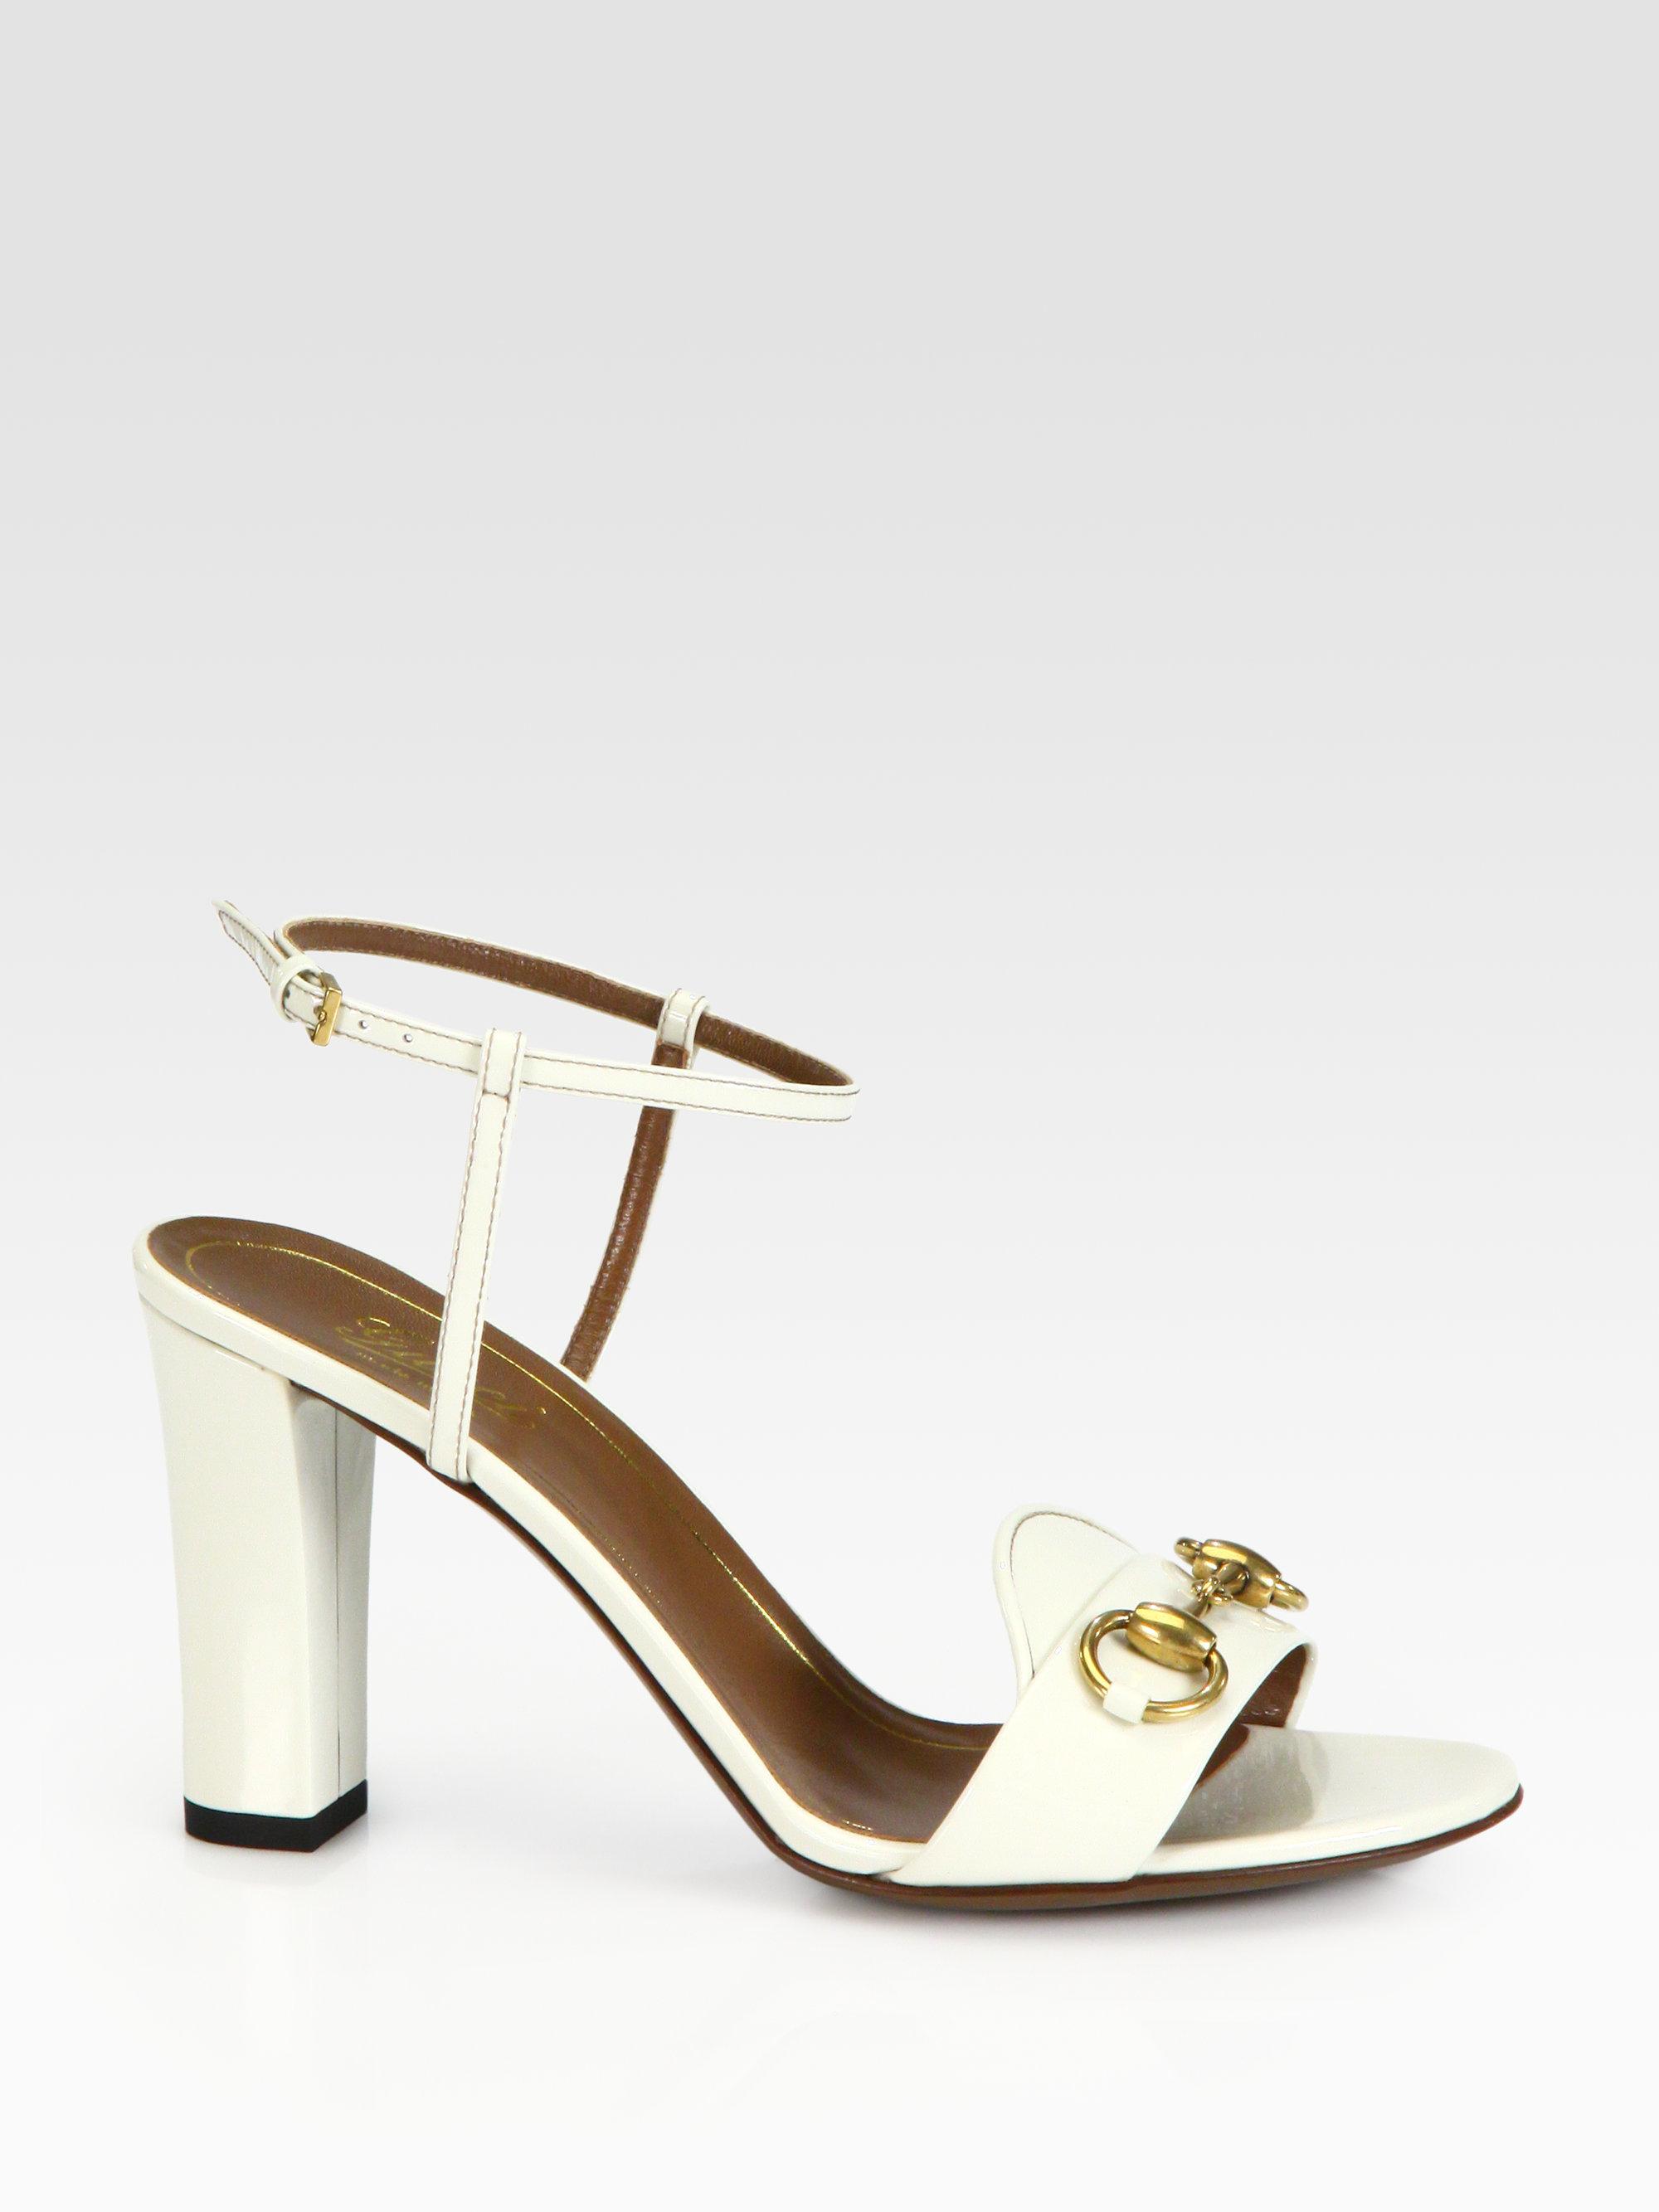 41309d57c149 Lyst - Gucci Patent Leather Horsebit Sandals in White